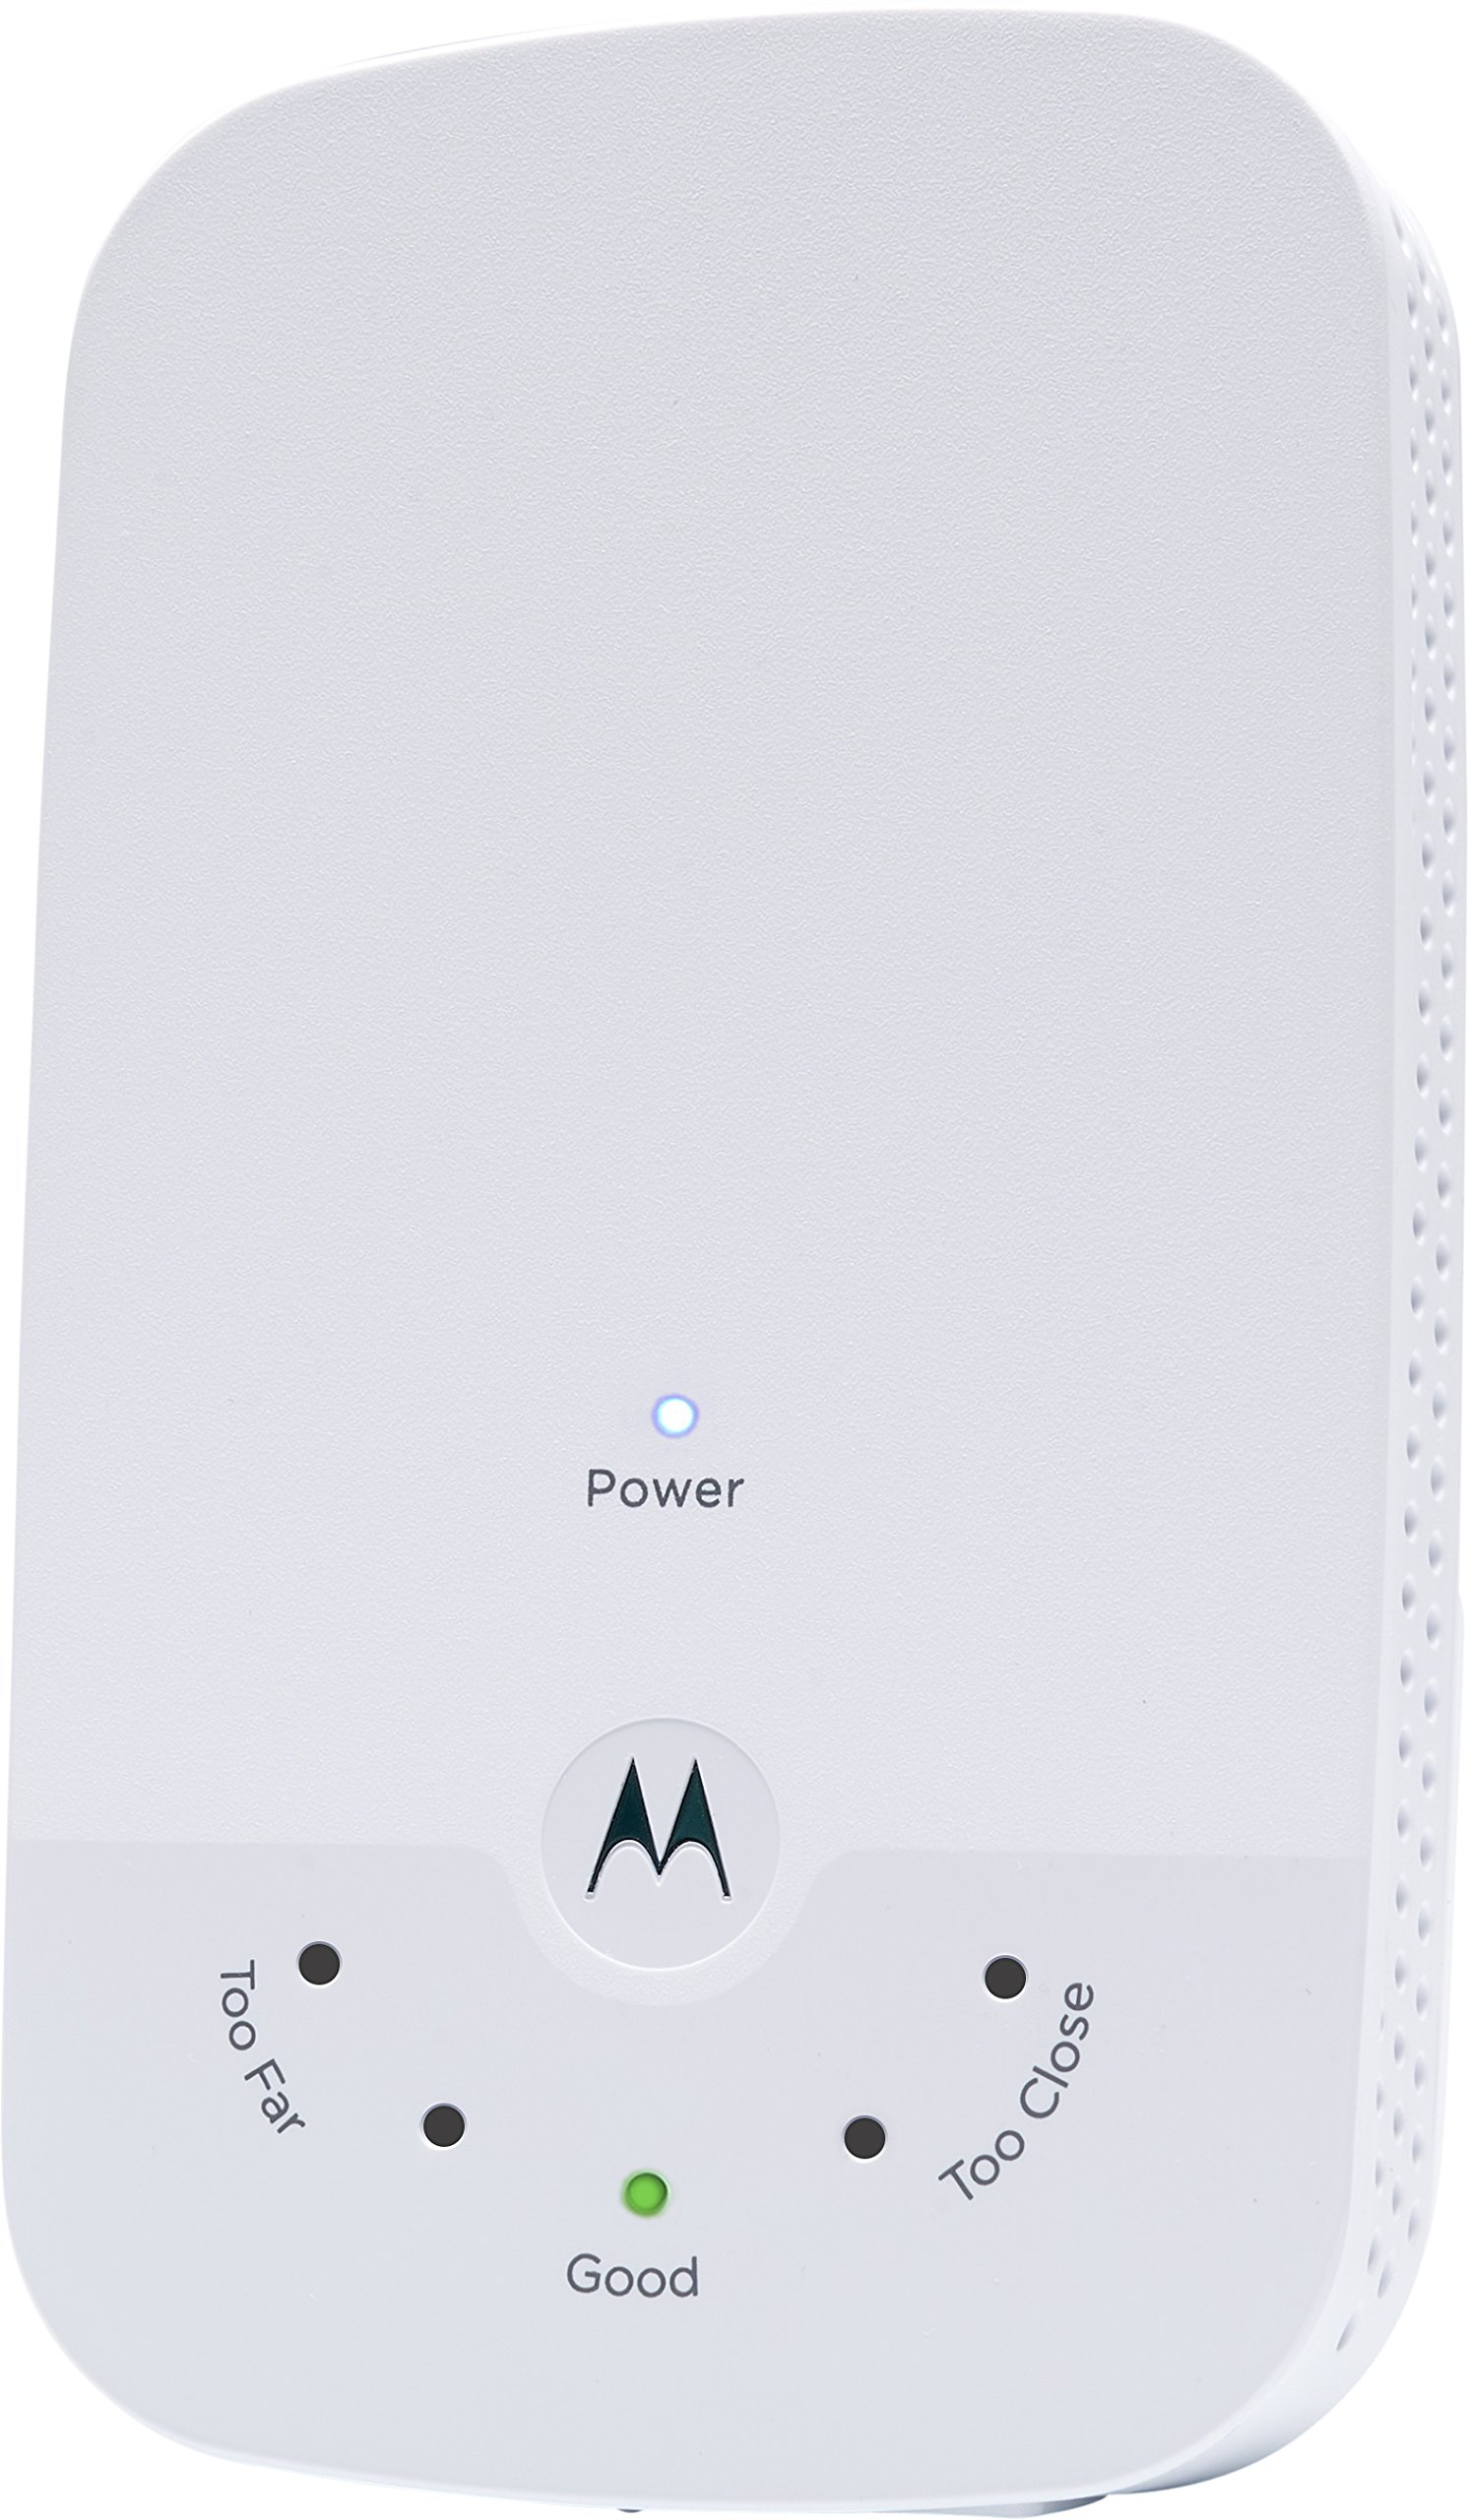 MOTOROLA AC1200 WiFi Range Extender with Gigabit Ethernet, Dual Band, Model MX1200 by Motorola (Image #1)